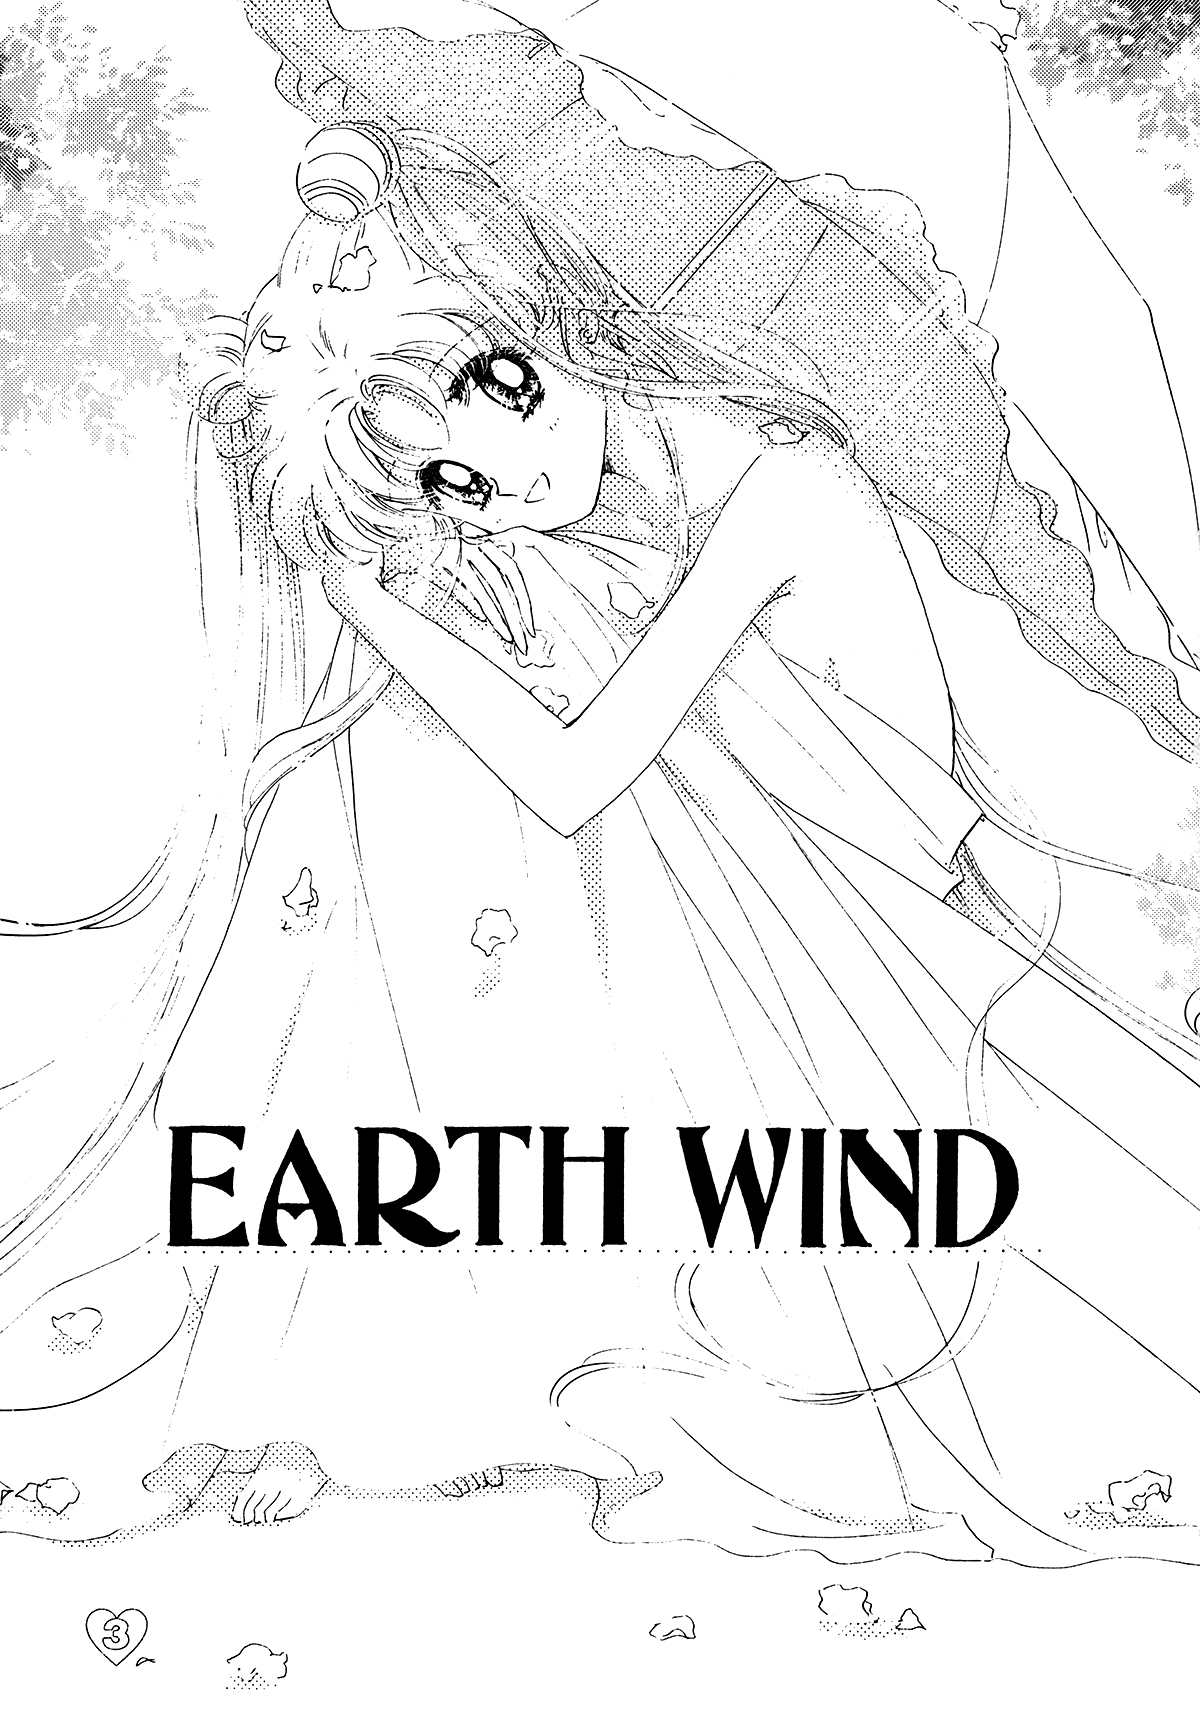 Earth_wind_3_03